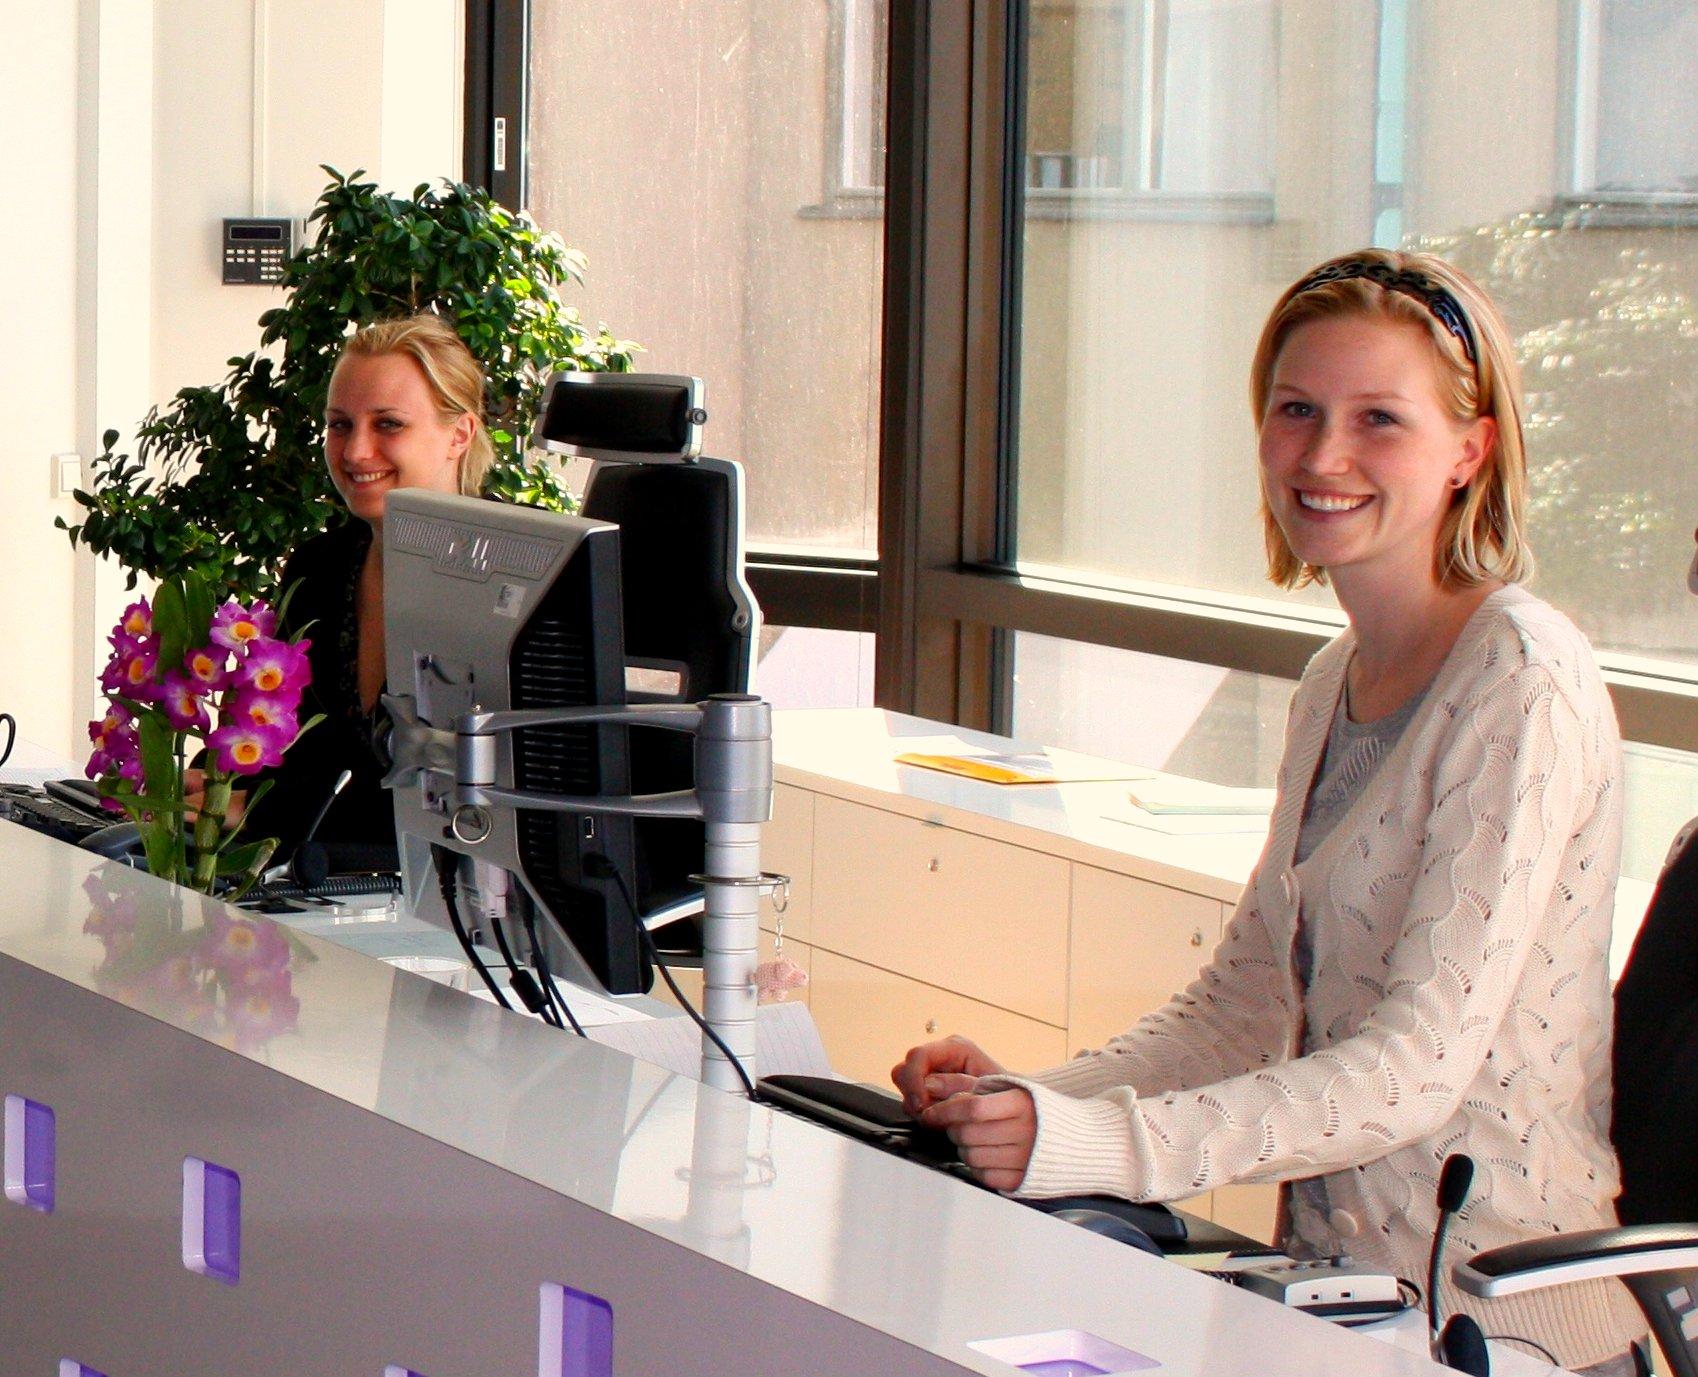 1. Receptionists